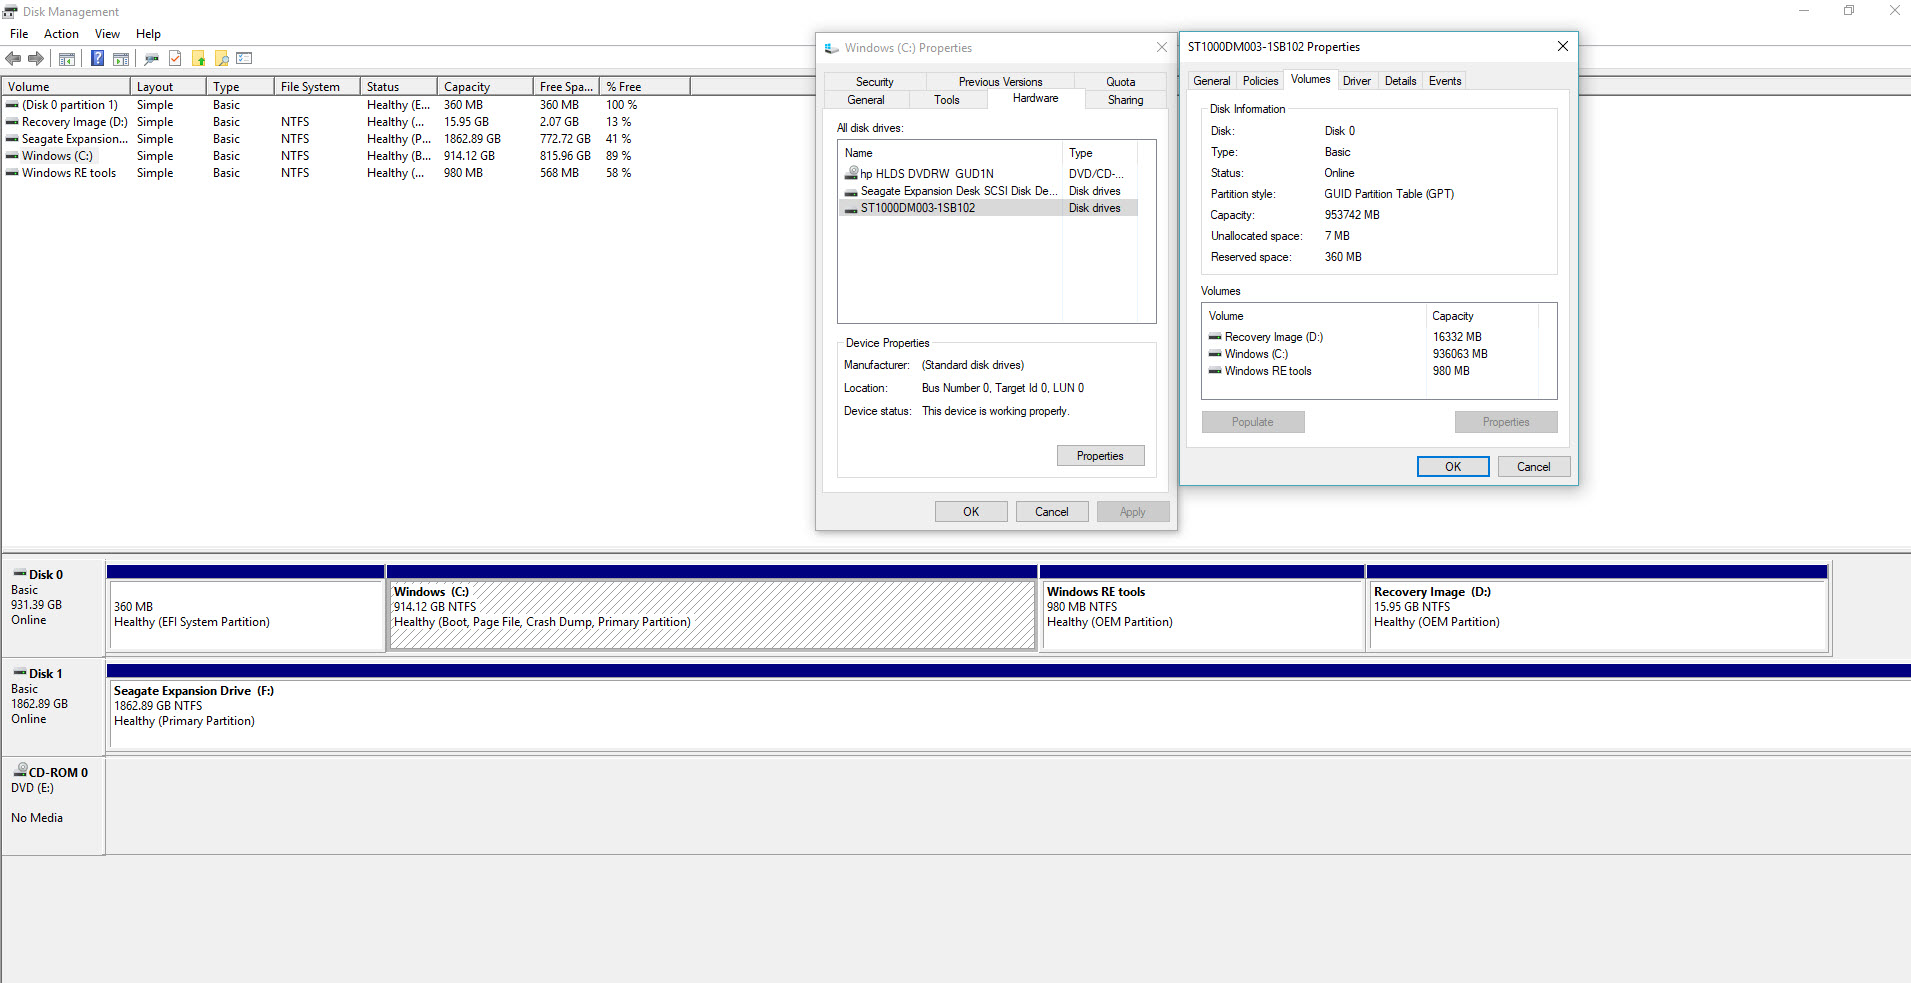 Usage of Samsung 960 PRO M 2 SSD (2TB) in a Z240 workstation